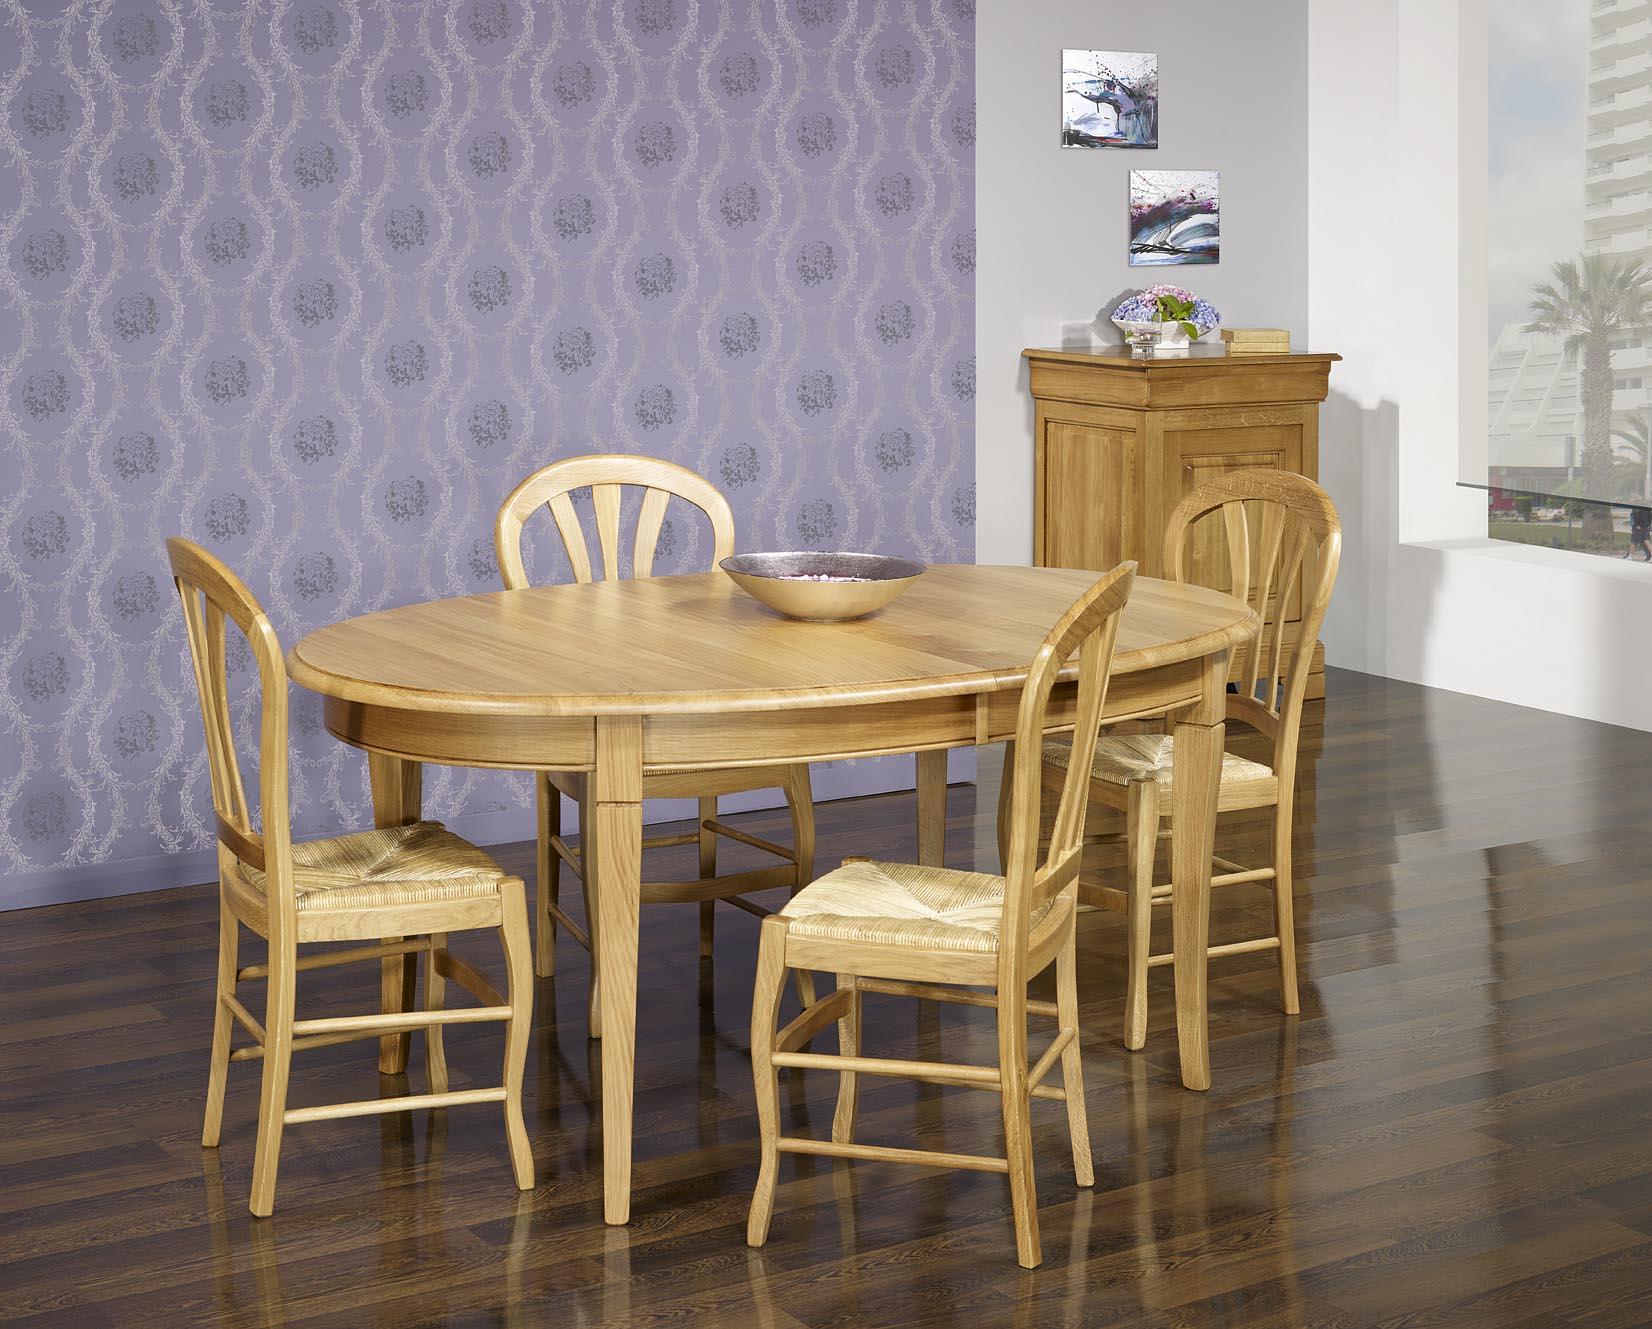 Table Ovale 170x110 En Chene Massif De Style Louis Philippe Avec 2